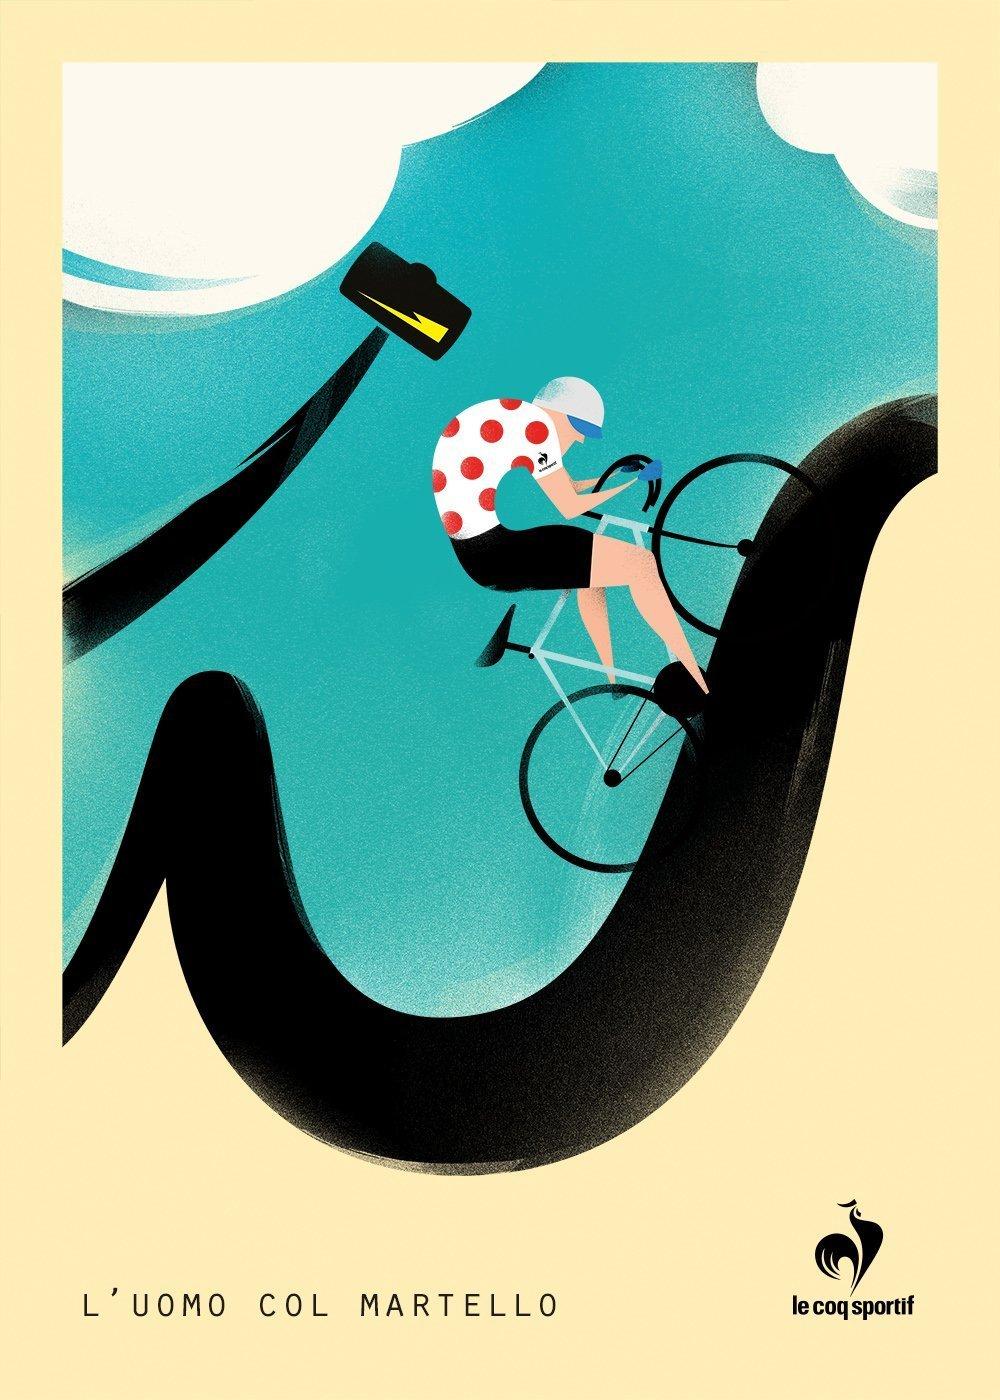 FINAL poster lecoq LUOMO COL MARTELLO   Tour de France con Le Coq Sportif